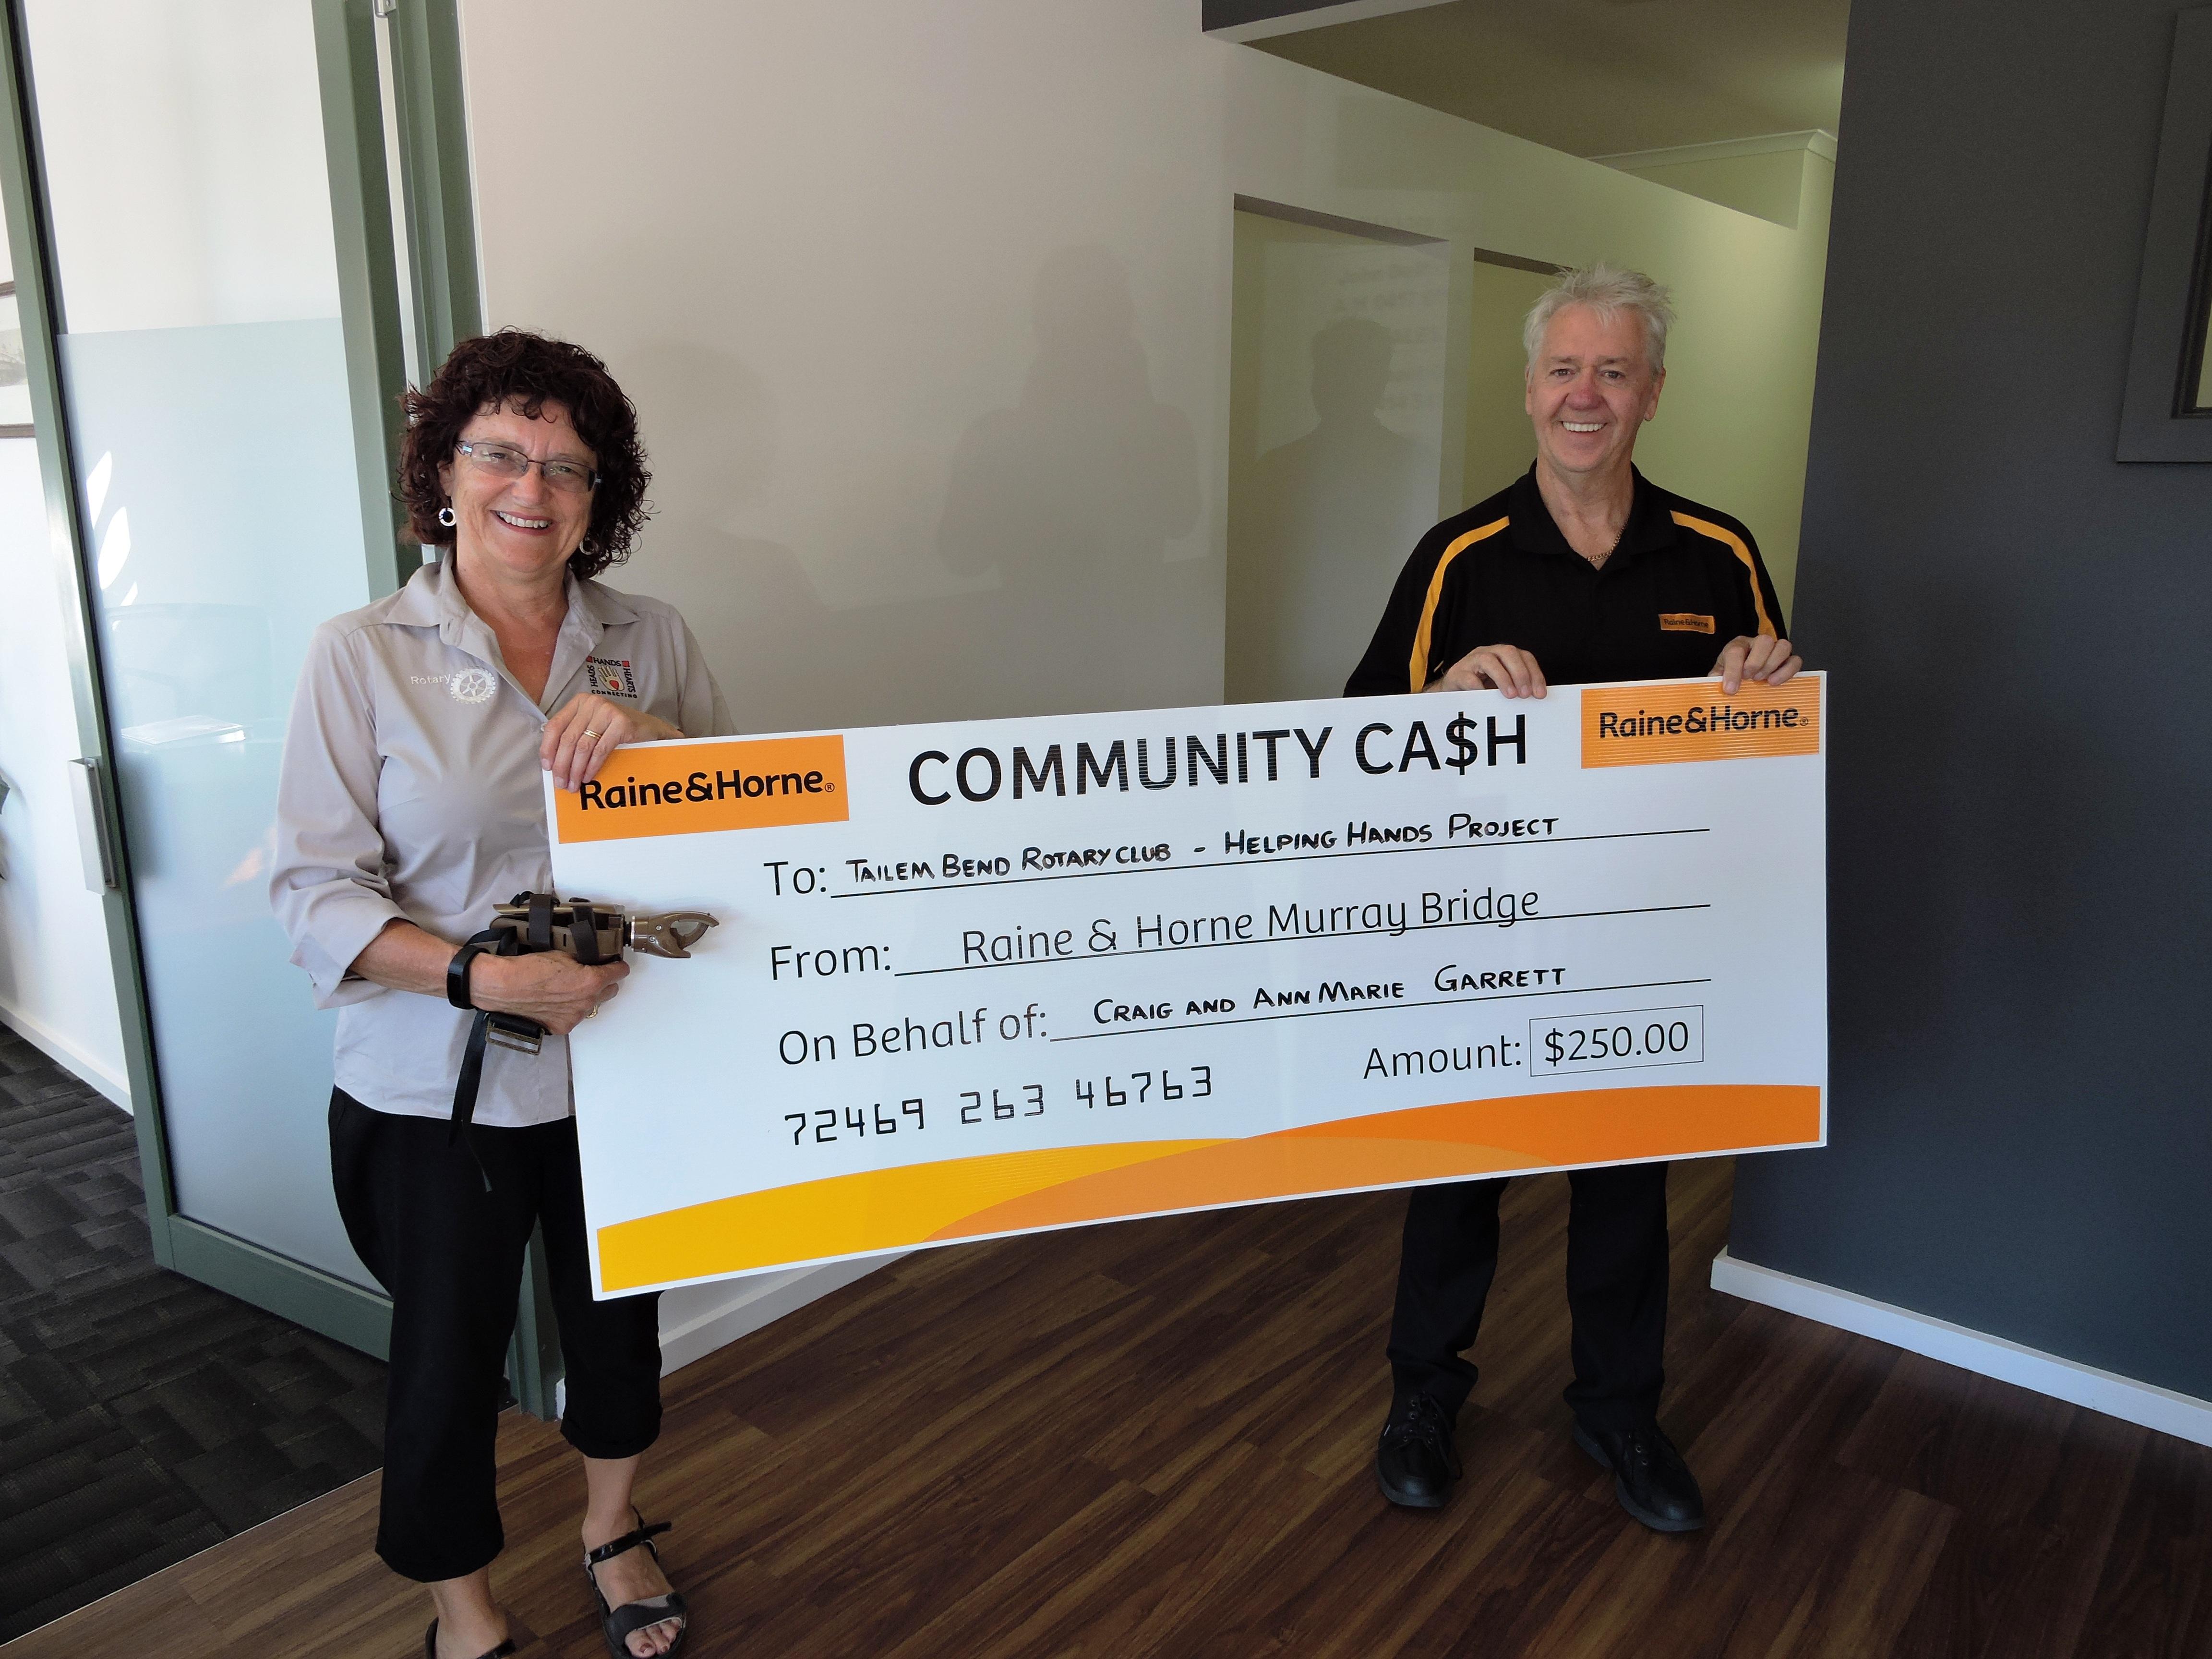 Tailem Bend Rotary Club - Murraylands Community Cash